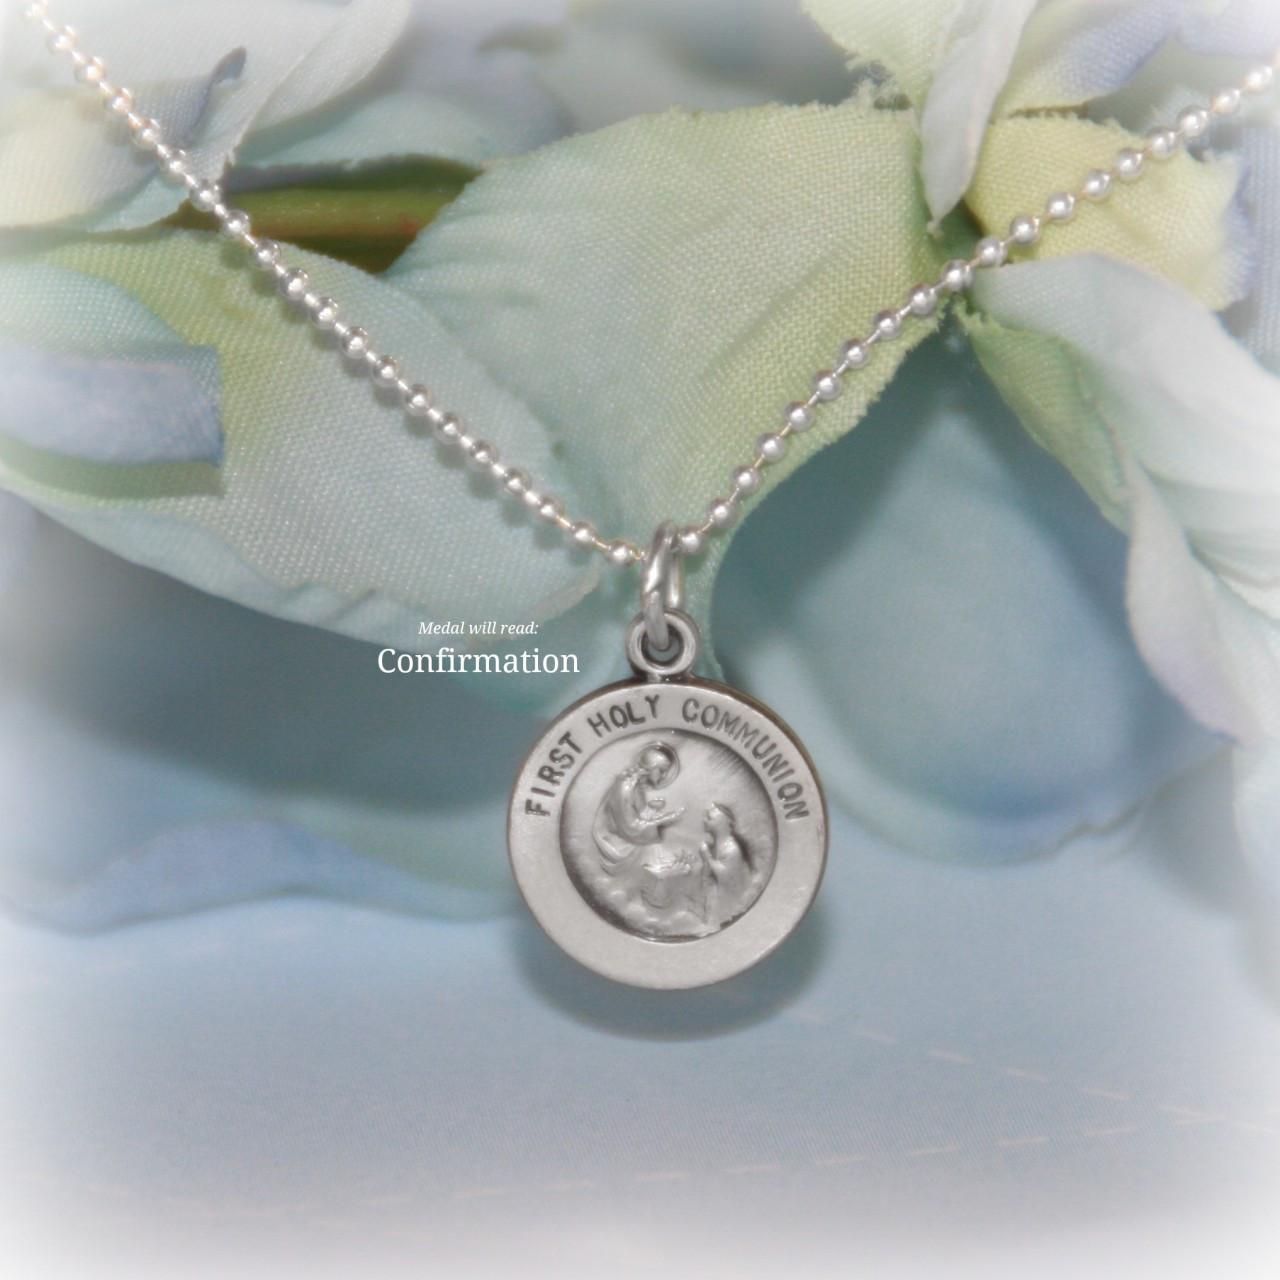 STG-223  Confirmation Sterling Silver Medal Necklace